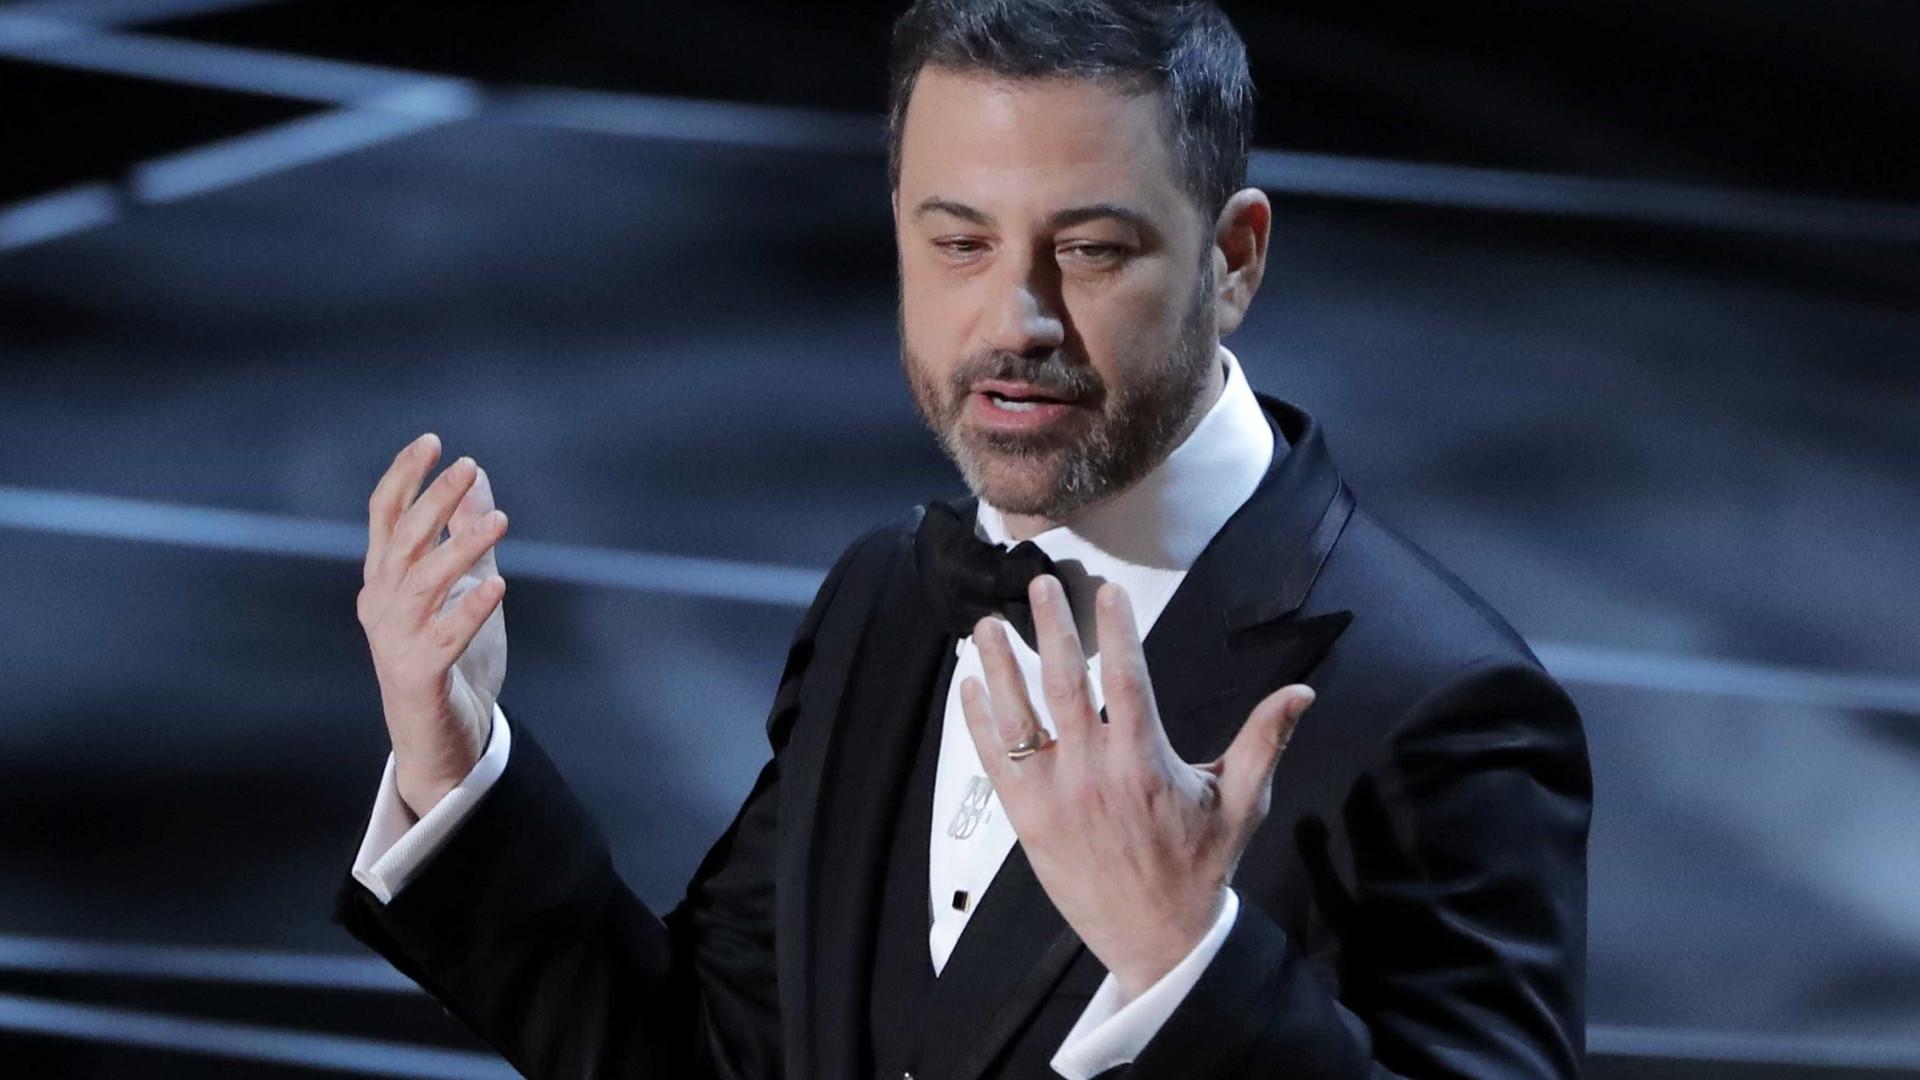 Oscar 2018: Jimmy Kimmel alfineta e pede aplausos a Harvey Weinstein